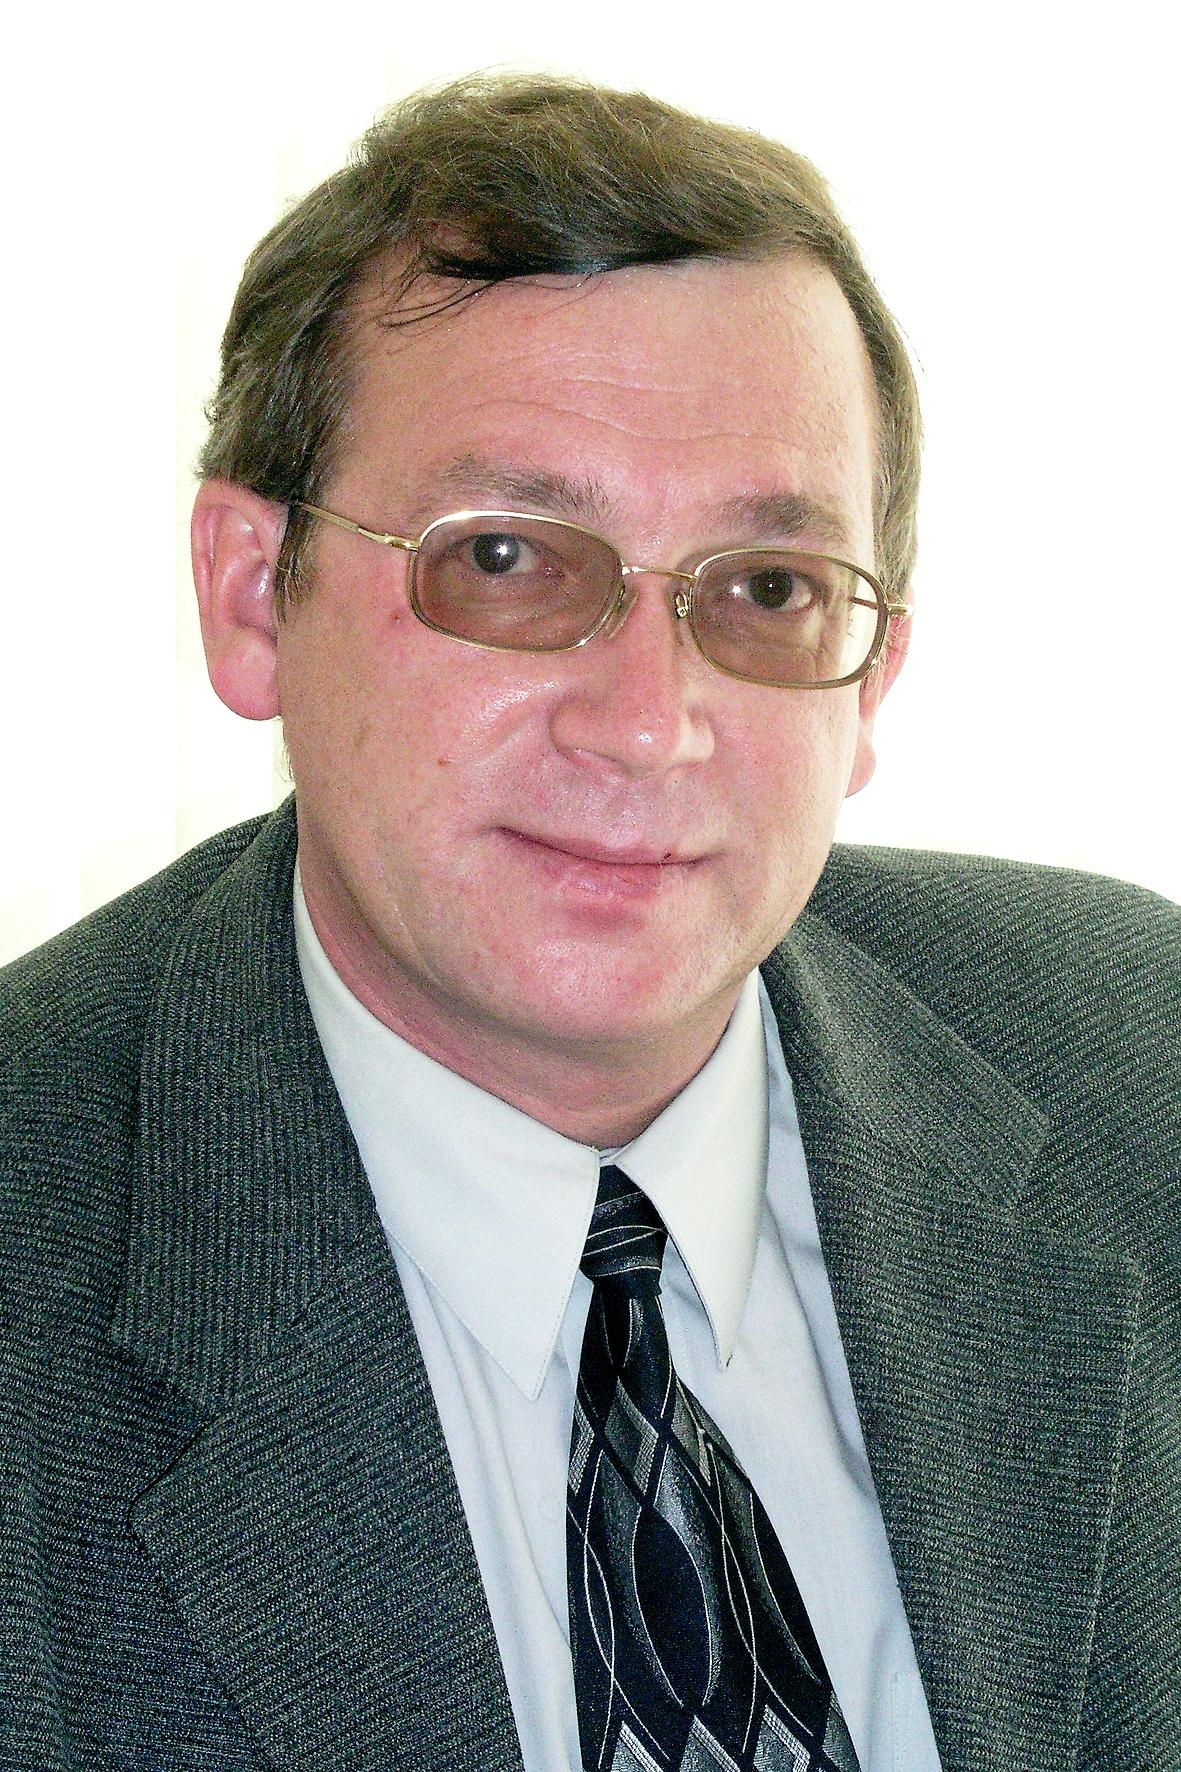 Столбов Вячеслав Алексеевич